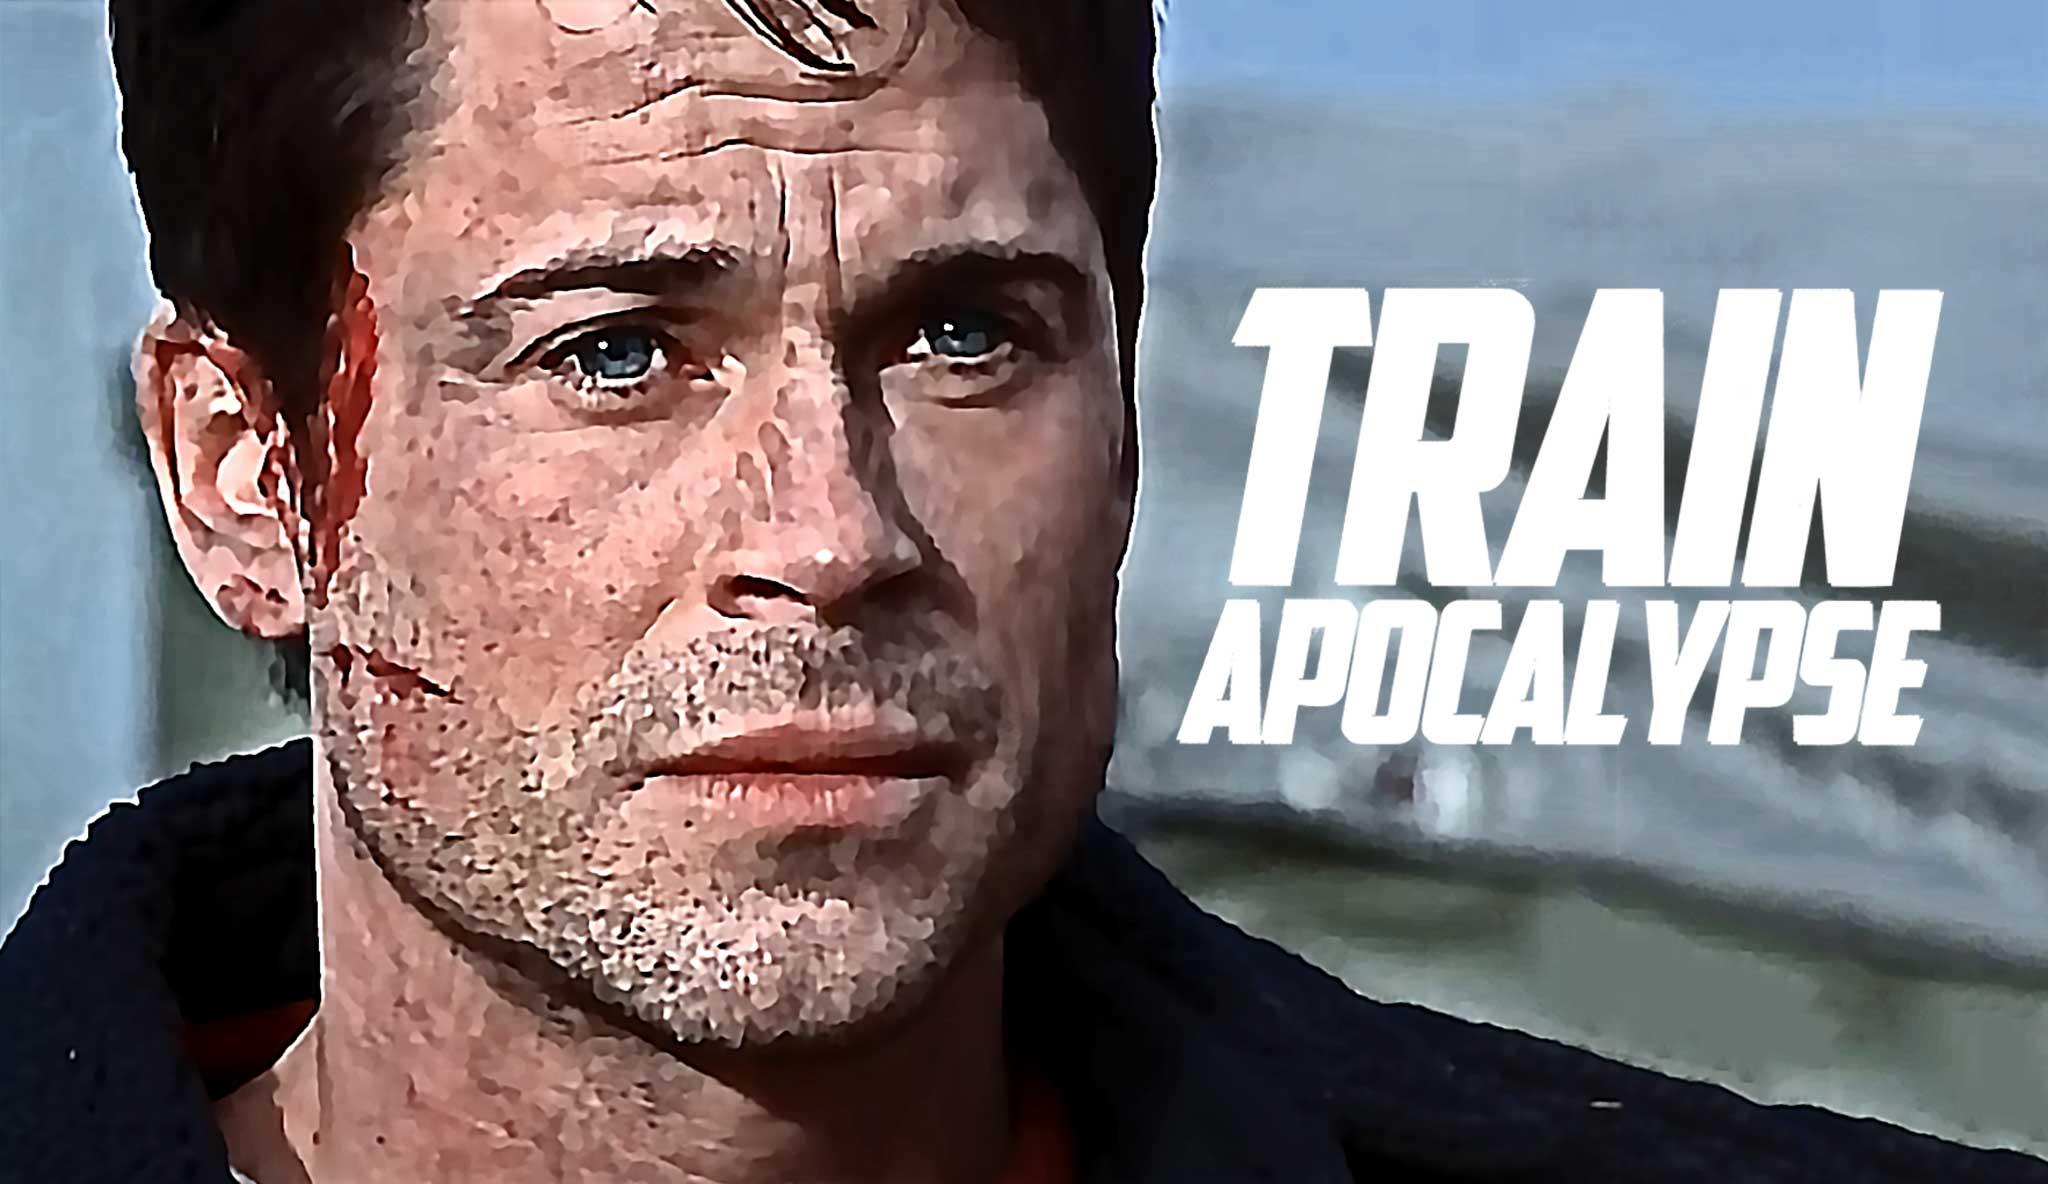 train-apocalypse-keiner-kann-ihn-stoppen\header.jpg